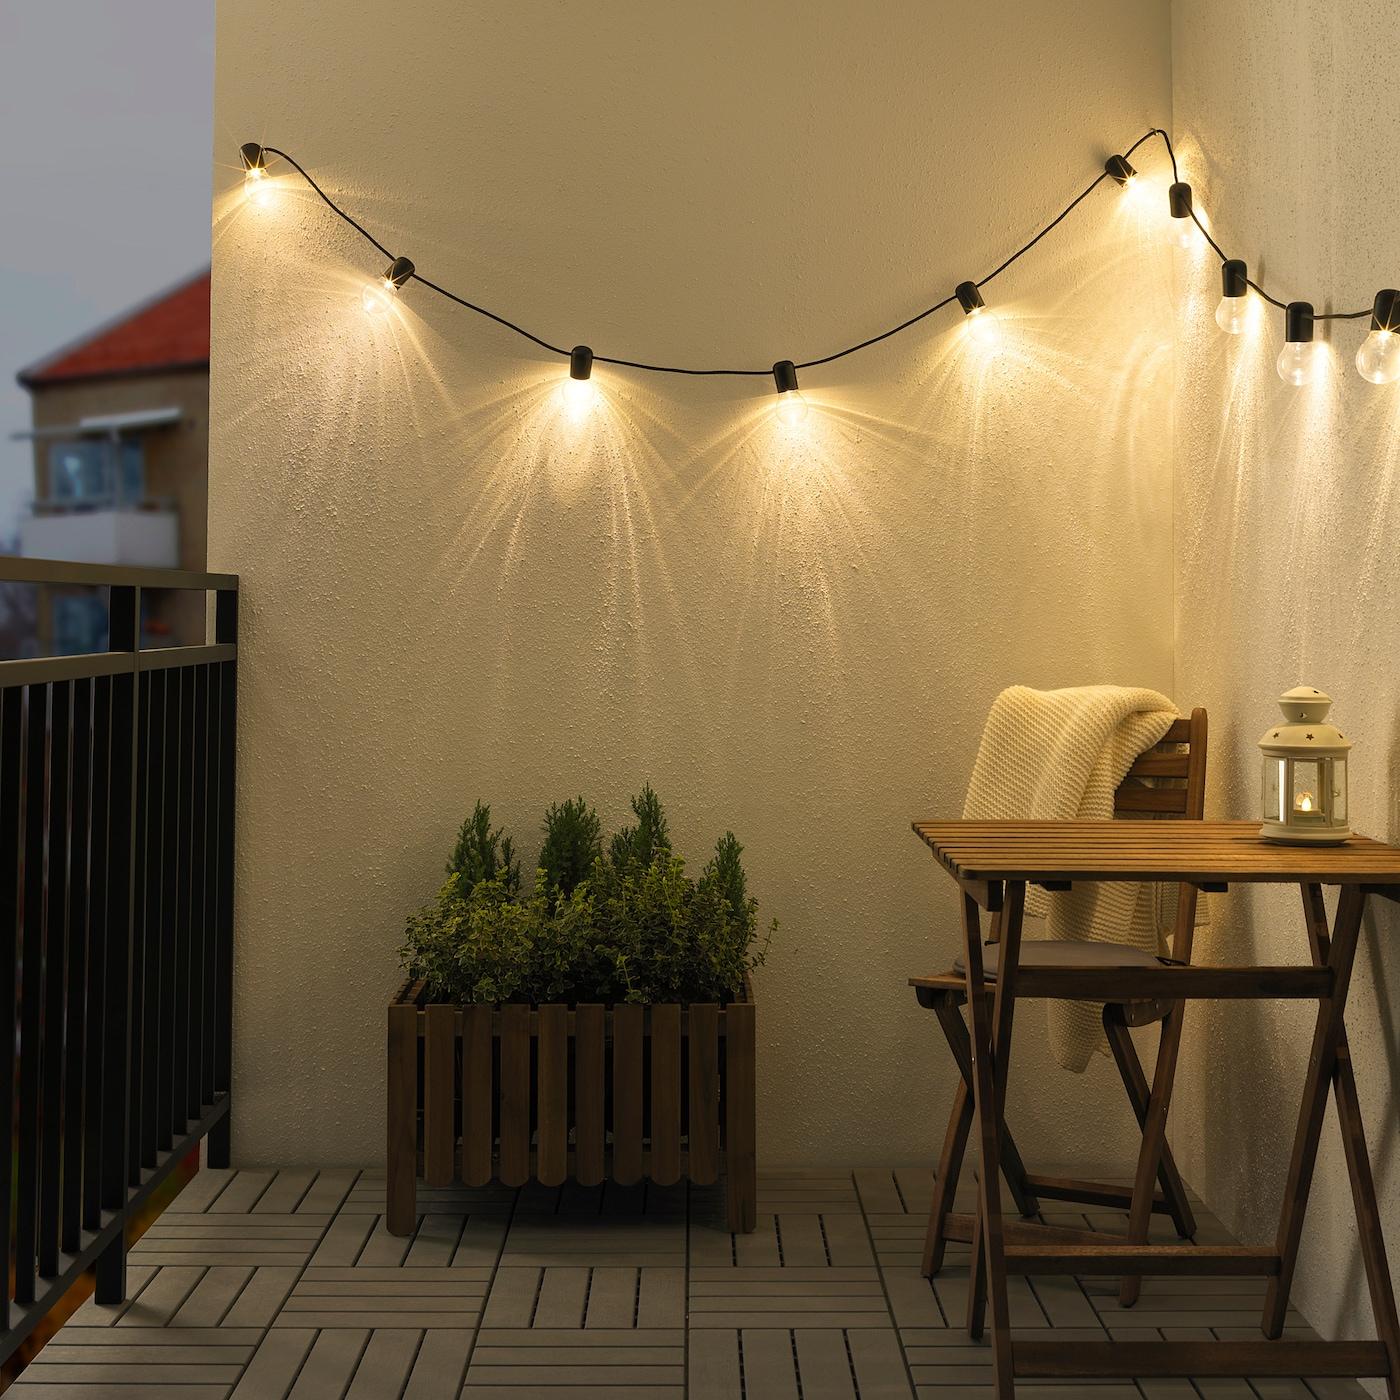 SVARTRÅ LED ljusslinga med 12 ljus svartutomhus